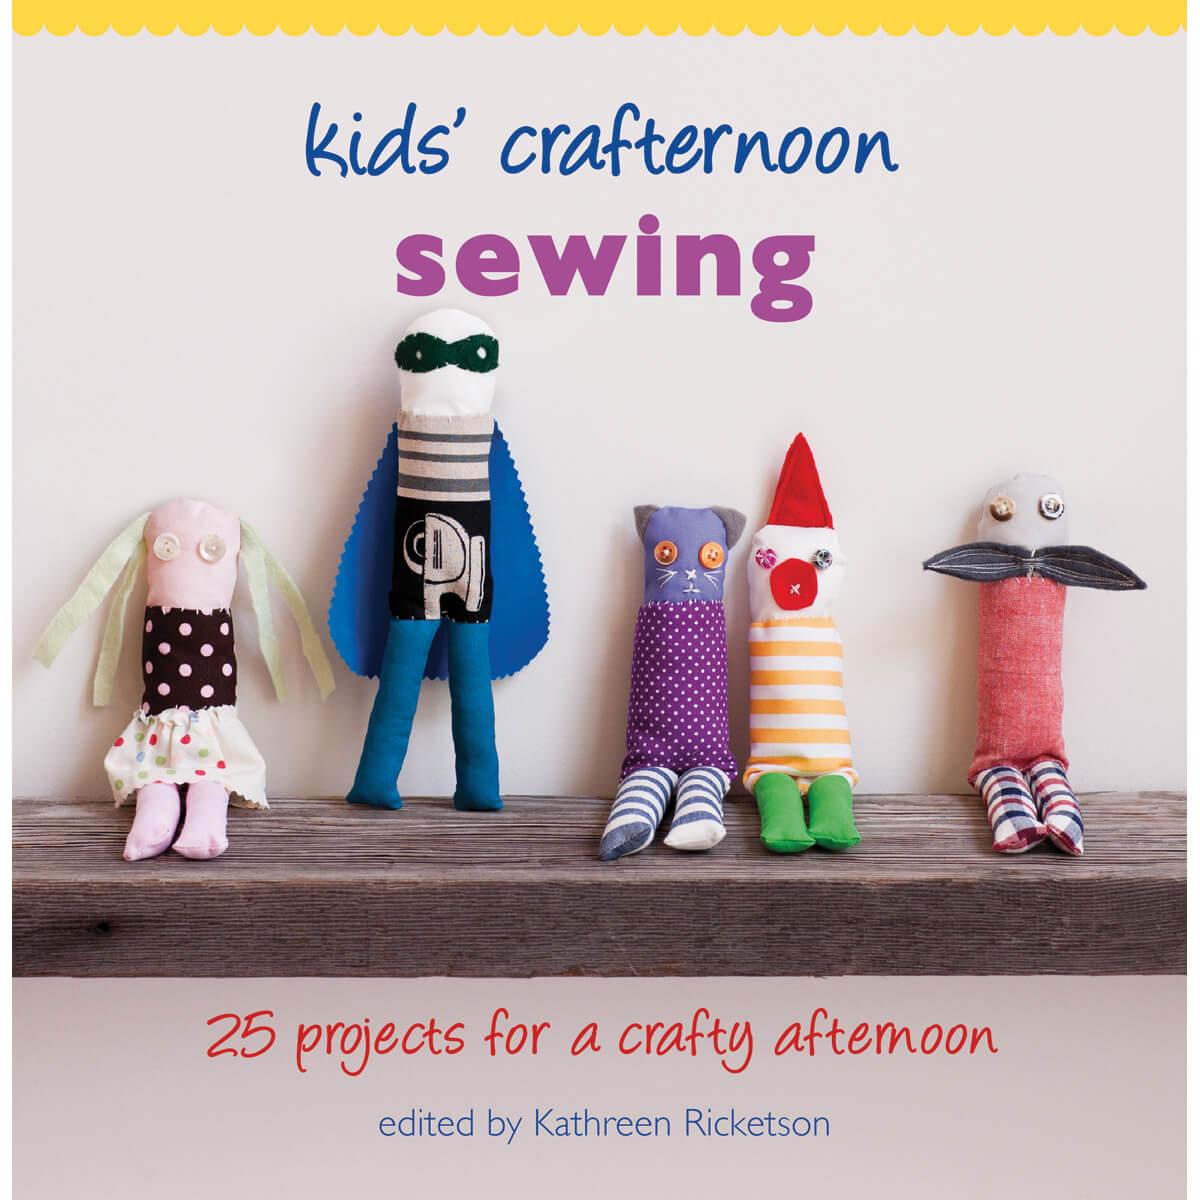 kids crafternoon sewing